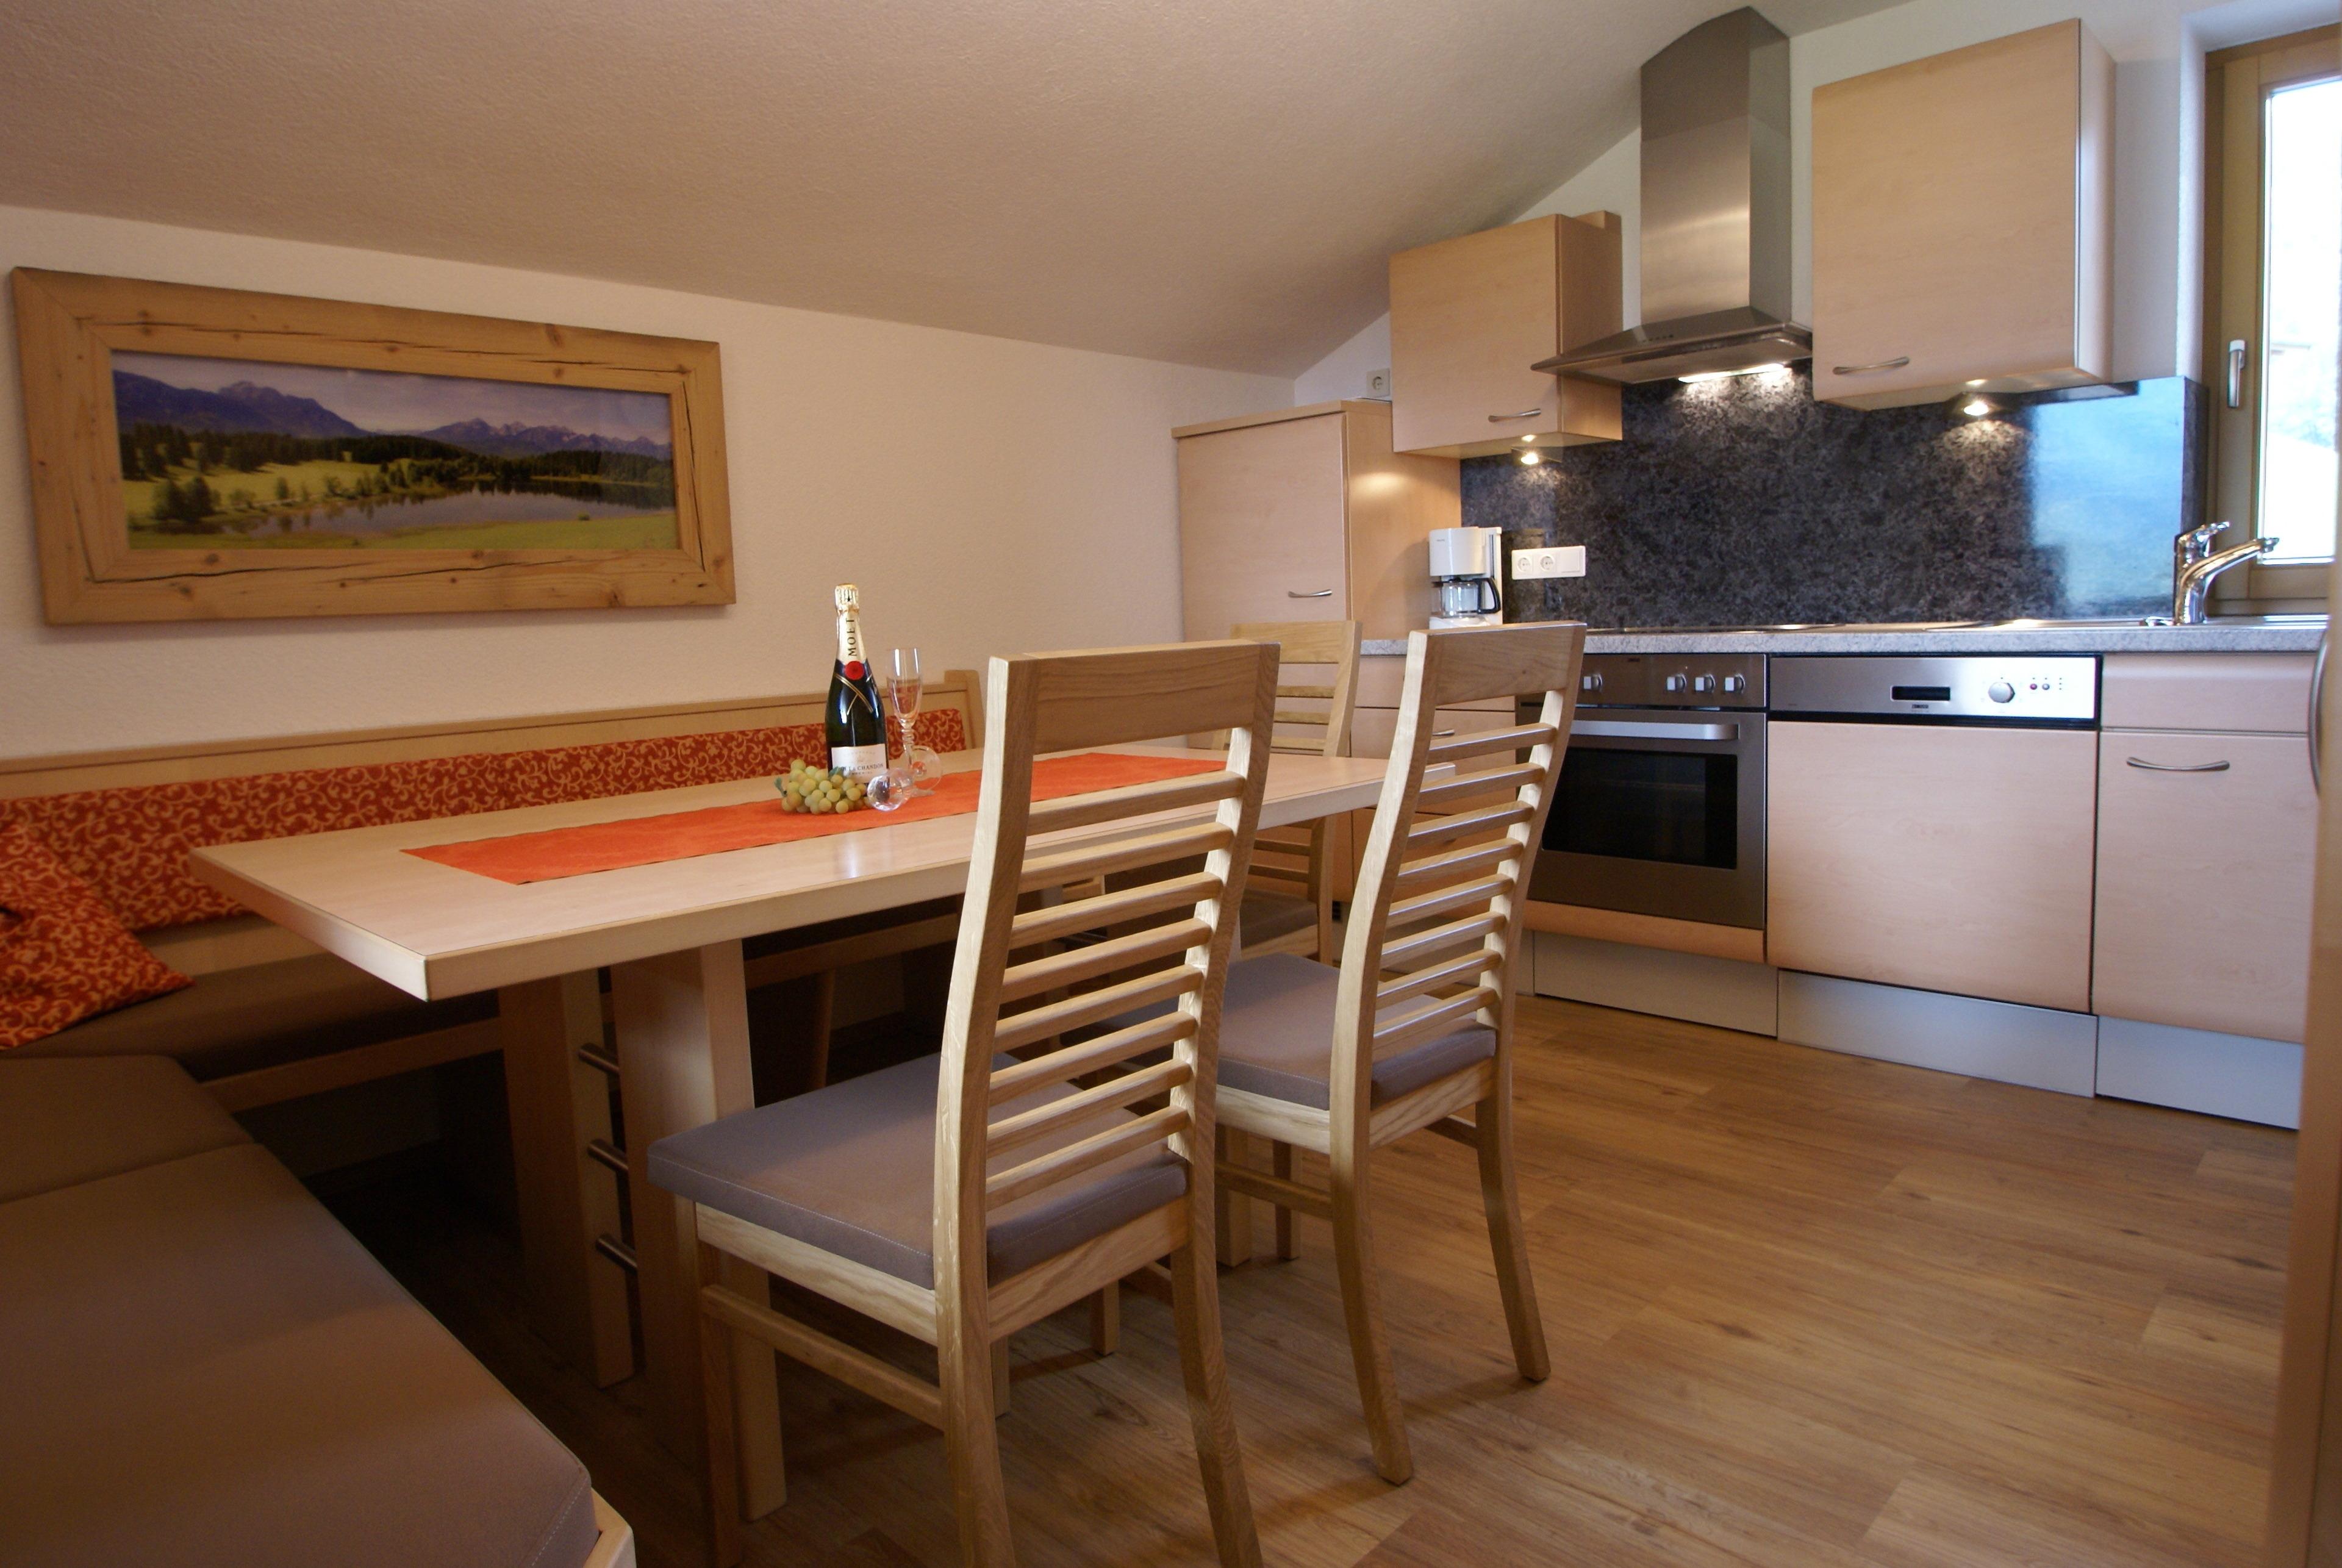 Appartement de vacances Haus Bergheim (2600374), Fügenberg, Zillertal, Tyrol, Autriche, image 7